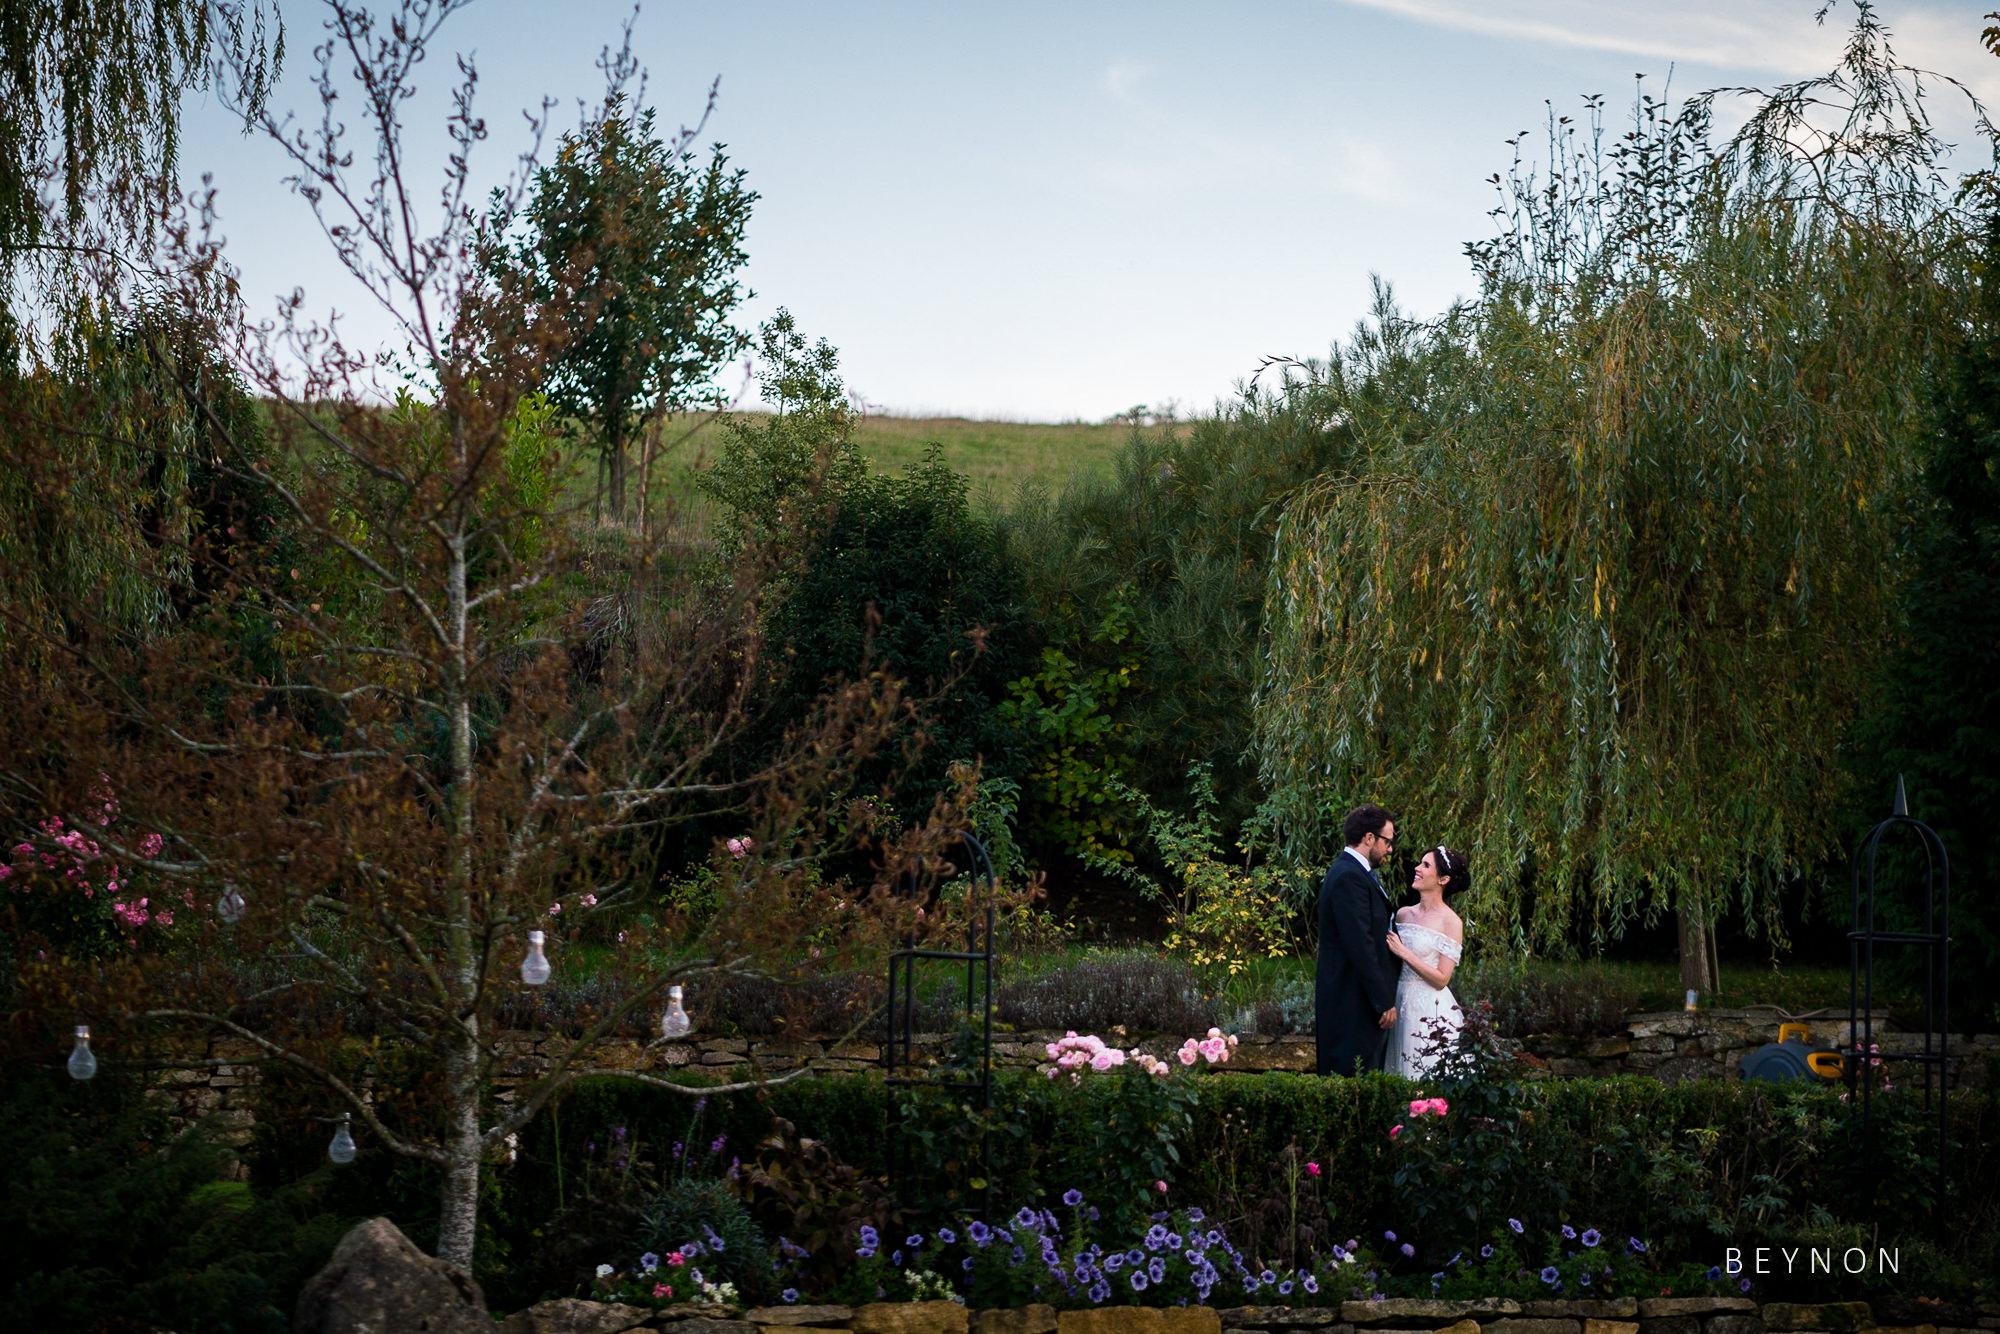 Romantic shot in grounds of Deer Park Hall